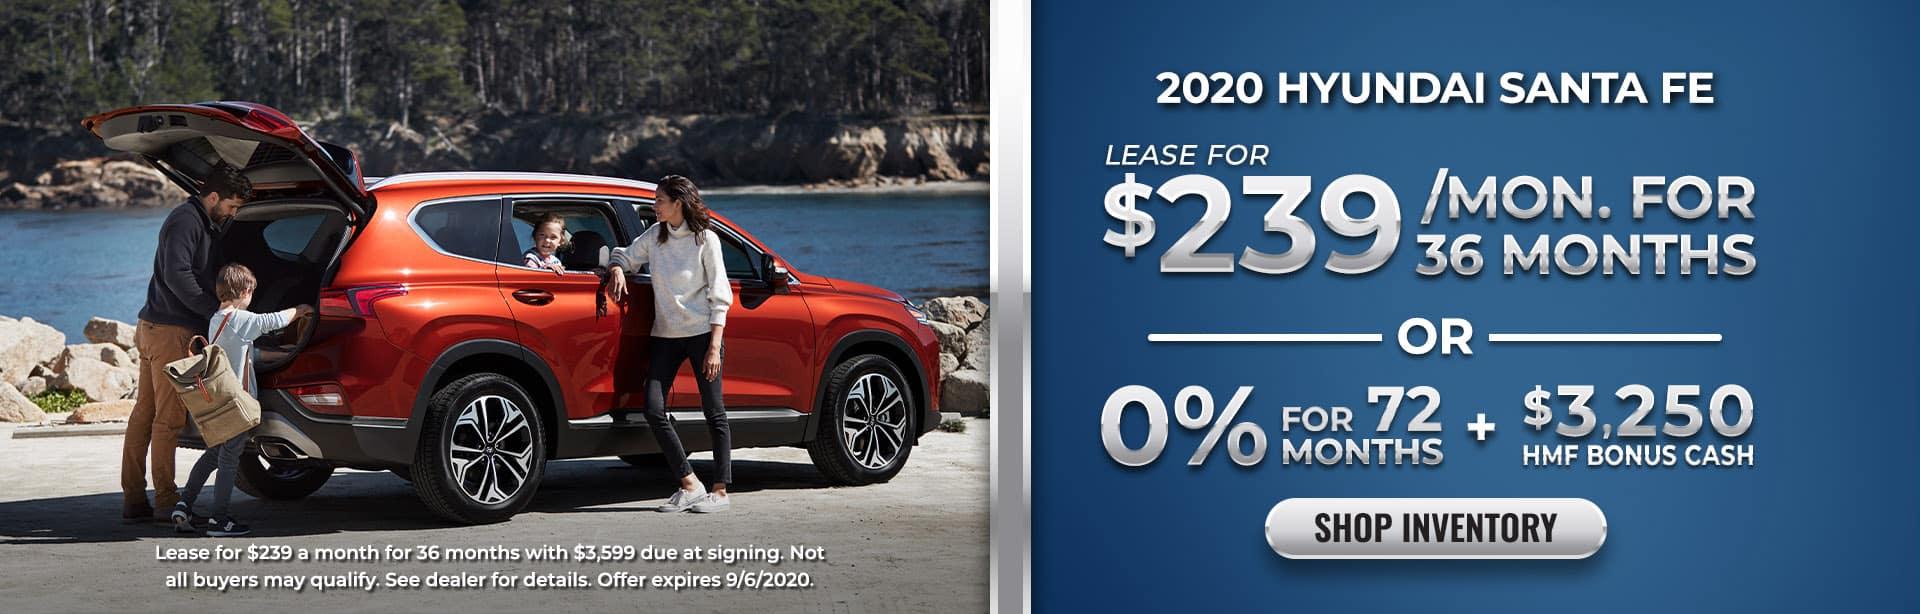 Lease or finance 2020 Santa Fe at Ed Voyles Hyundai of Smyrna, GA